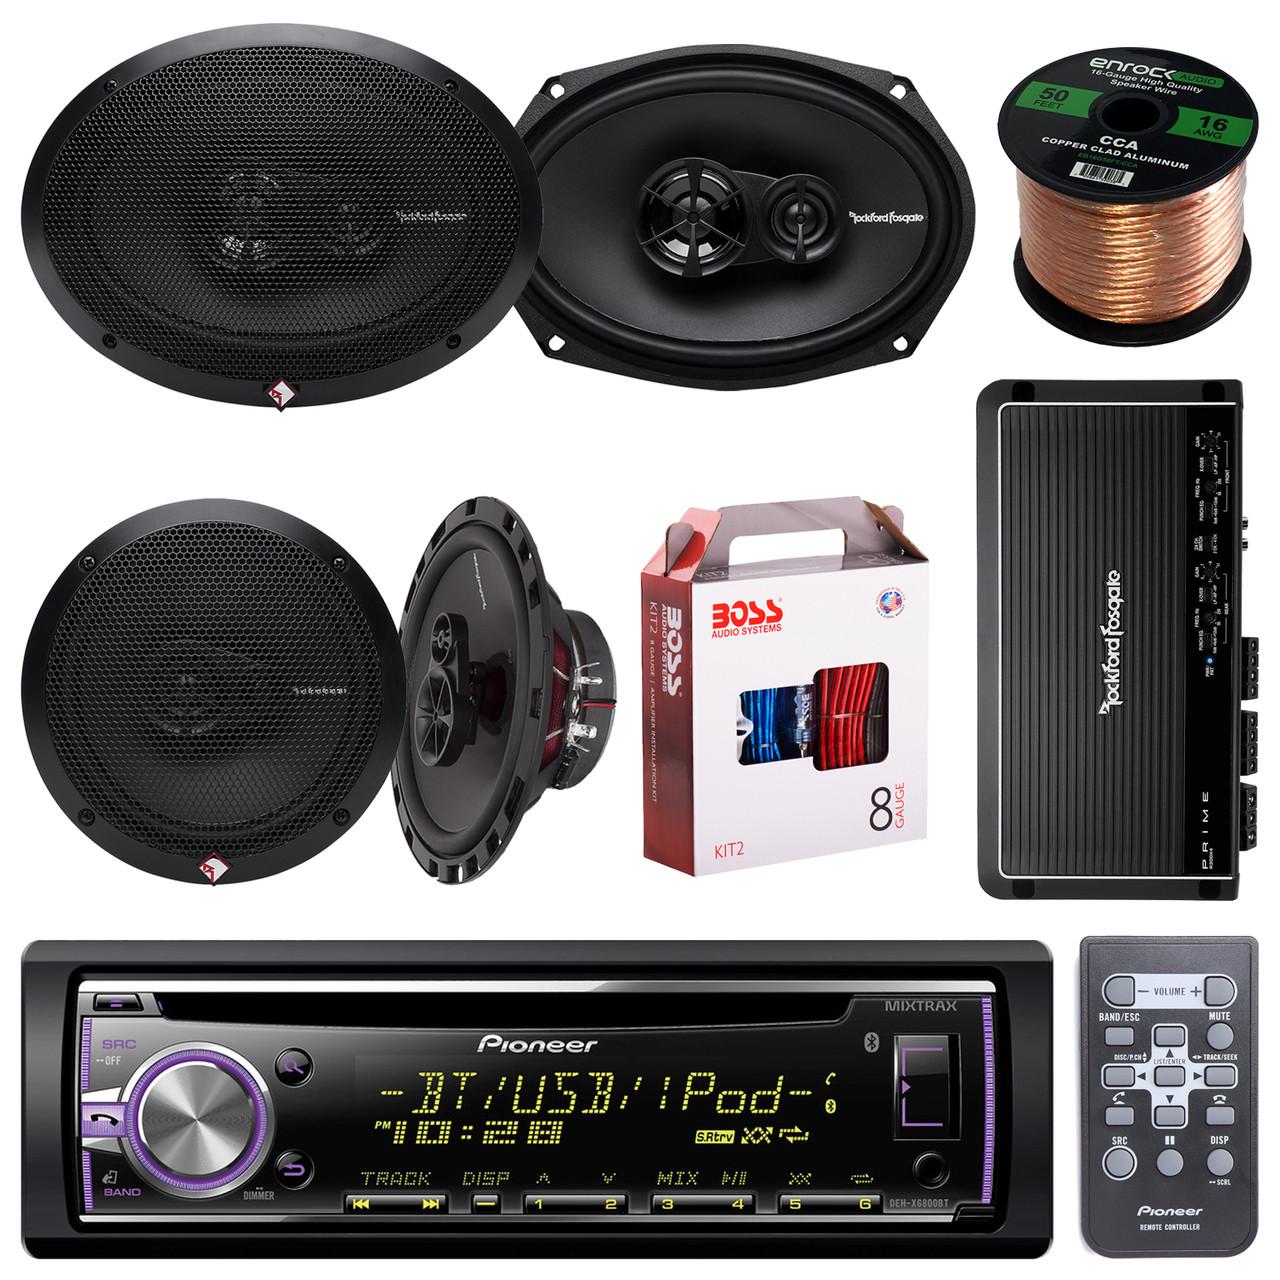 Pioneer DEHX6900BT Bluetooth Car CD Receiver Bundle Combo With 2x Rockford  Fosgate R165X3 6 5